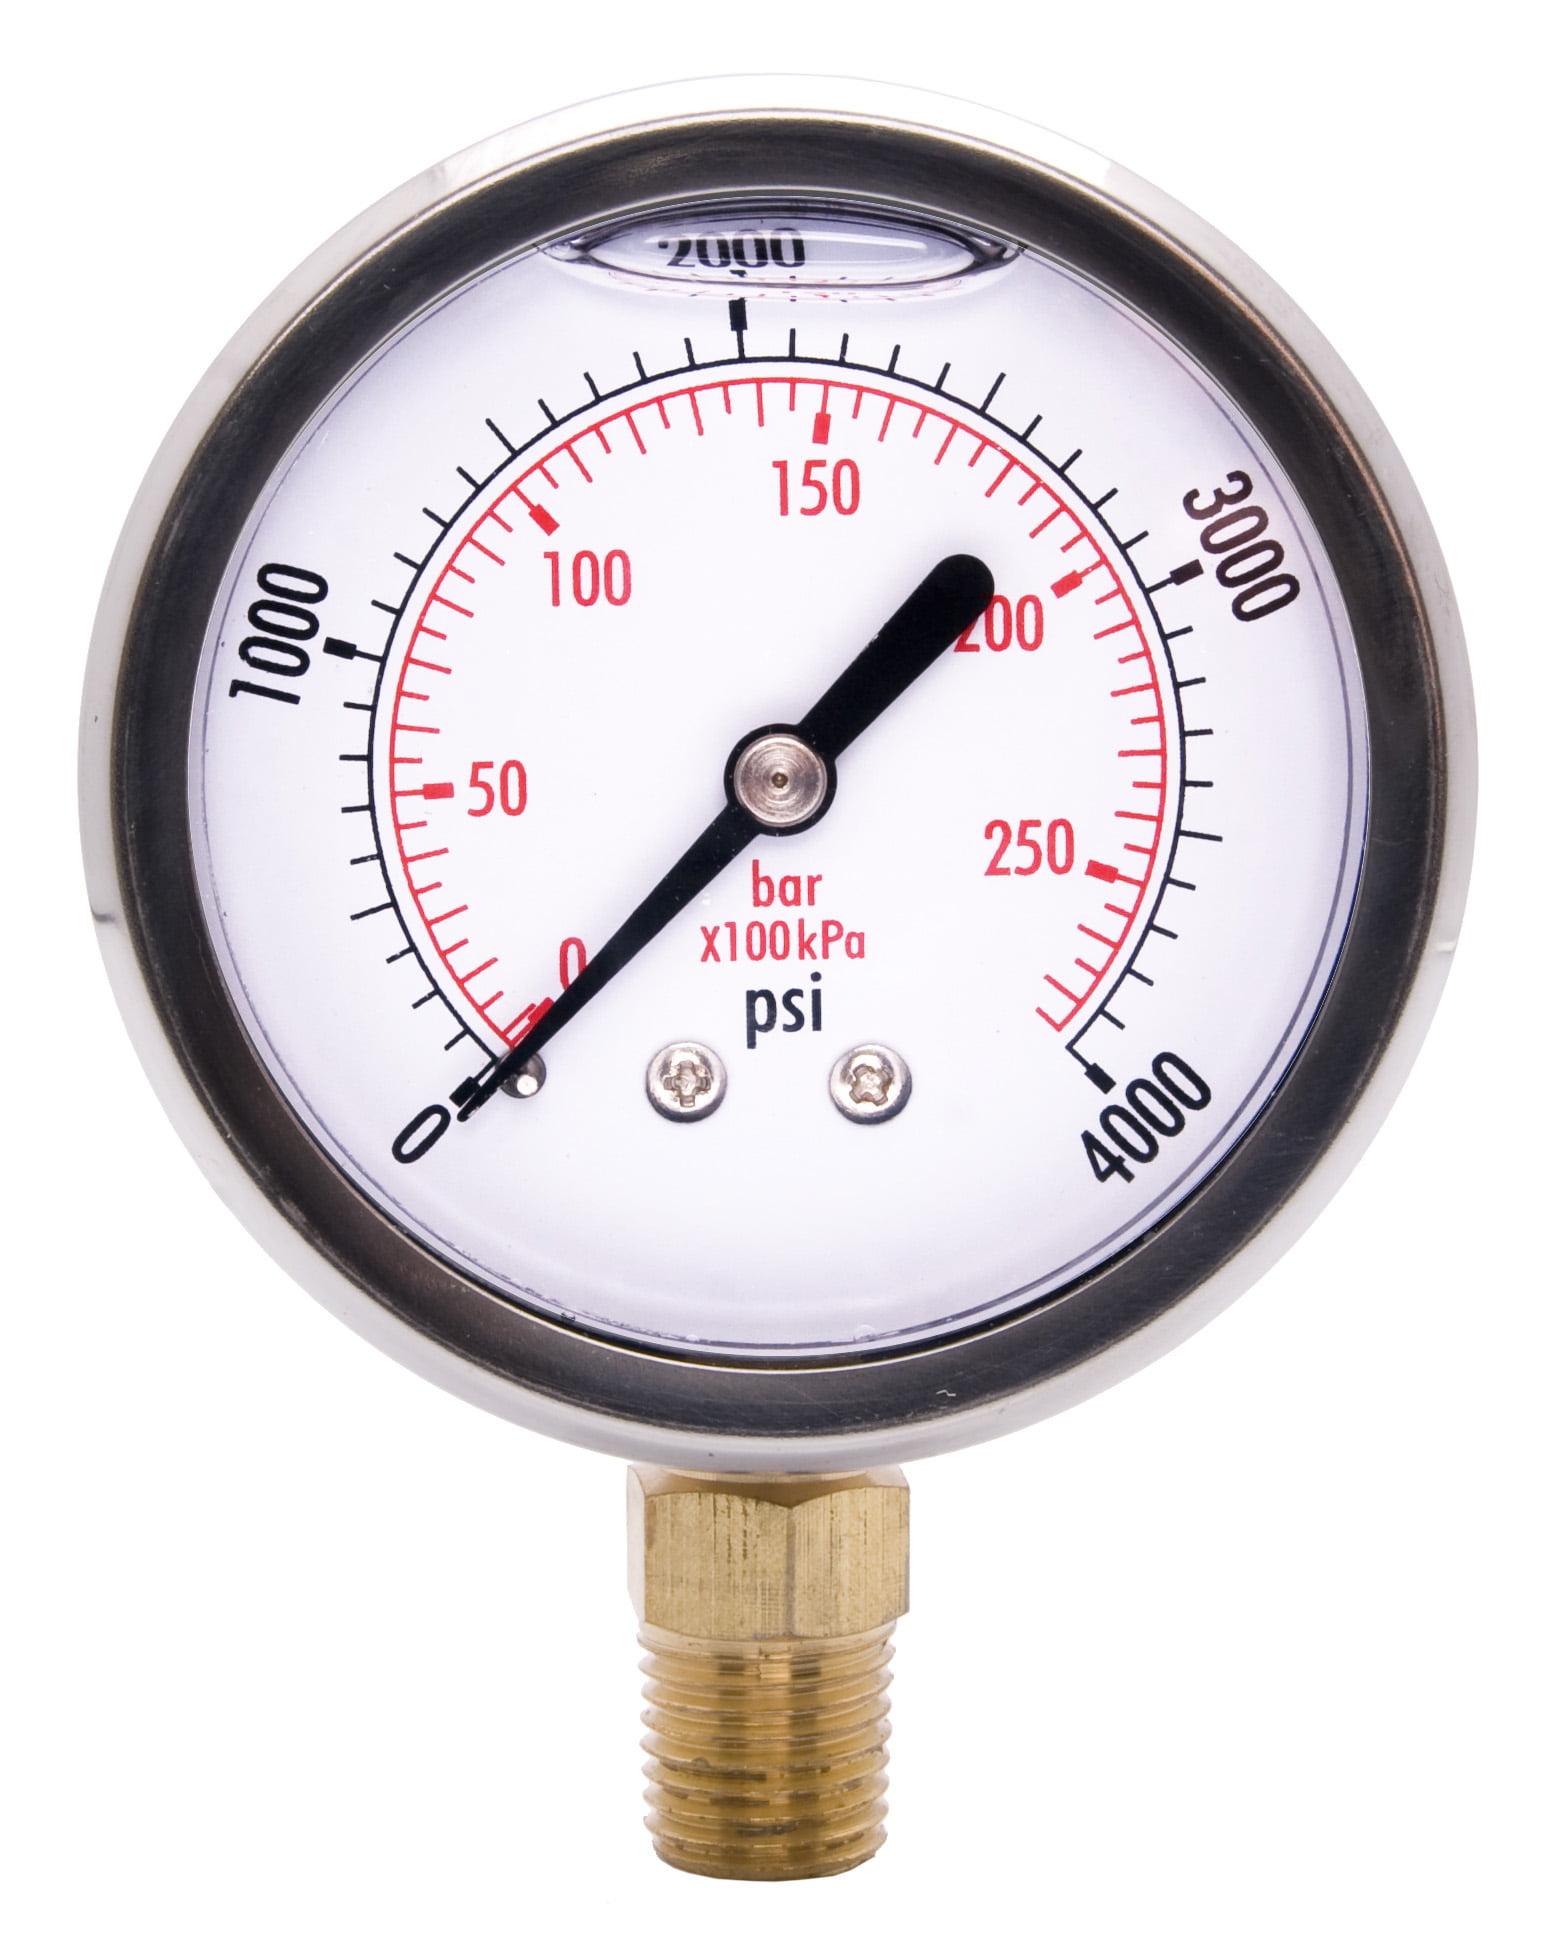 Stainless Steel lower mount 50mm Pressure Gauge swimming Pool Filter OIL FILLED